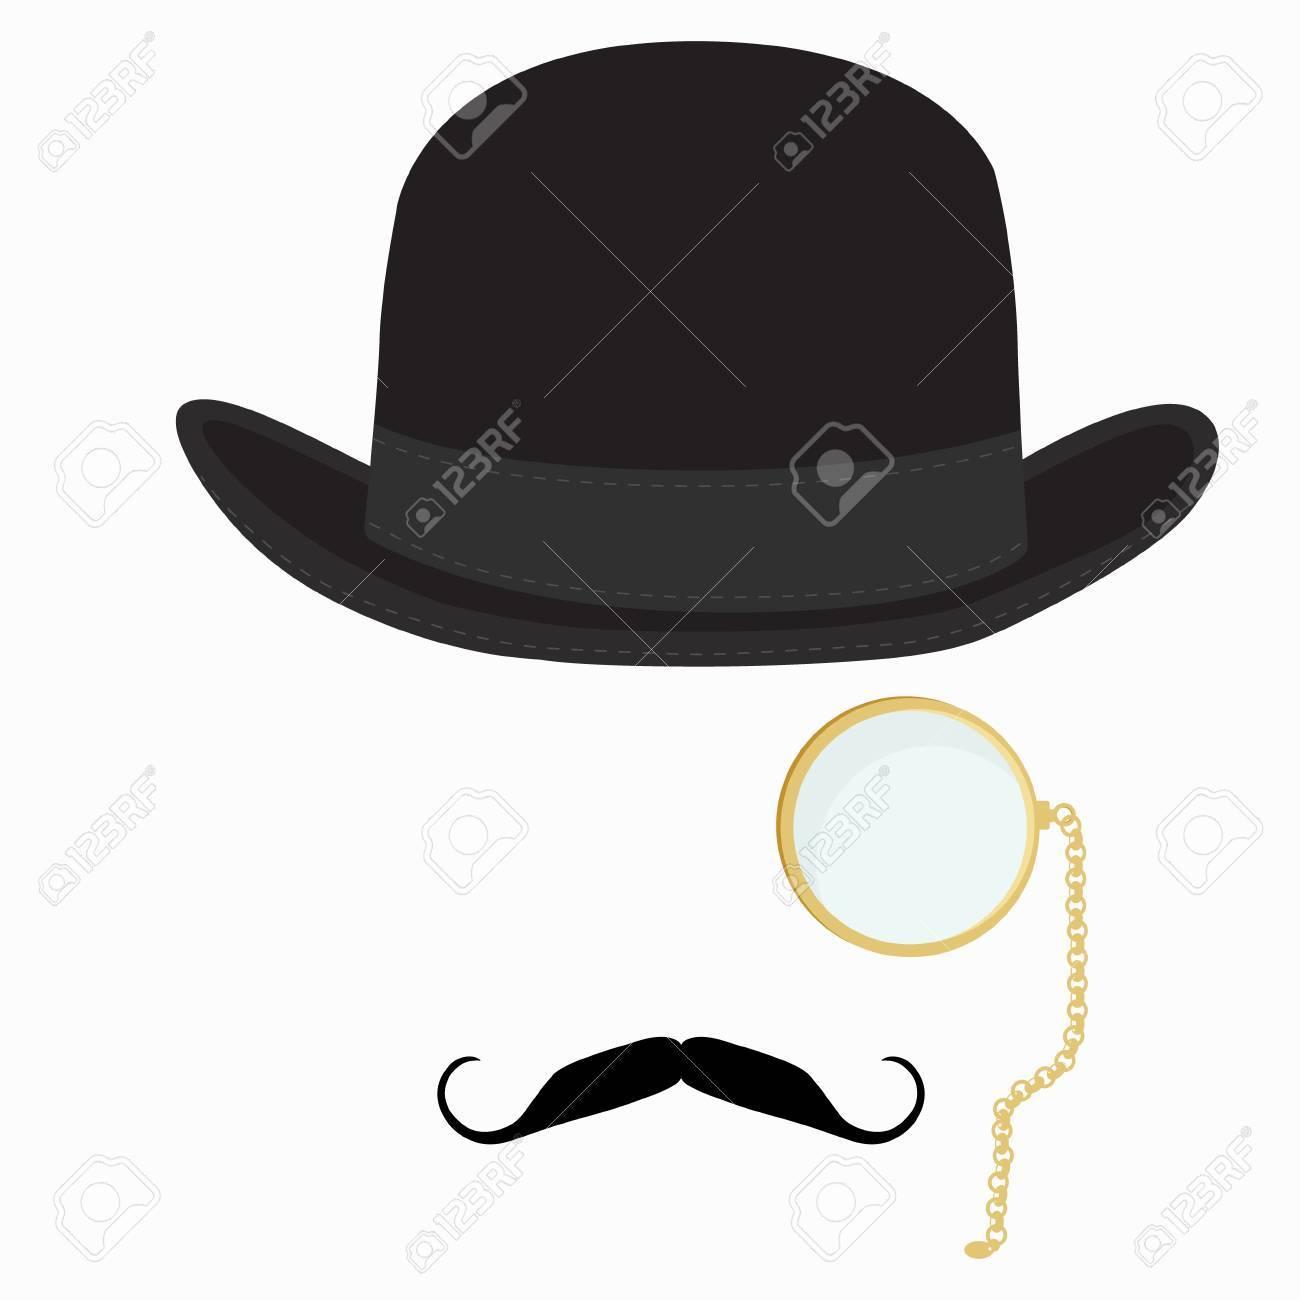 3e330b5b30afa Illustration - Raster illustration of black derby hat